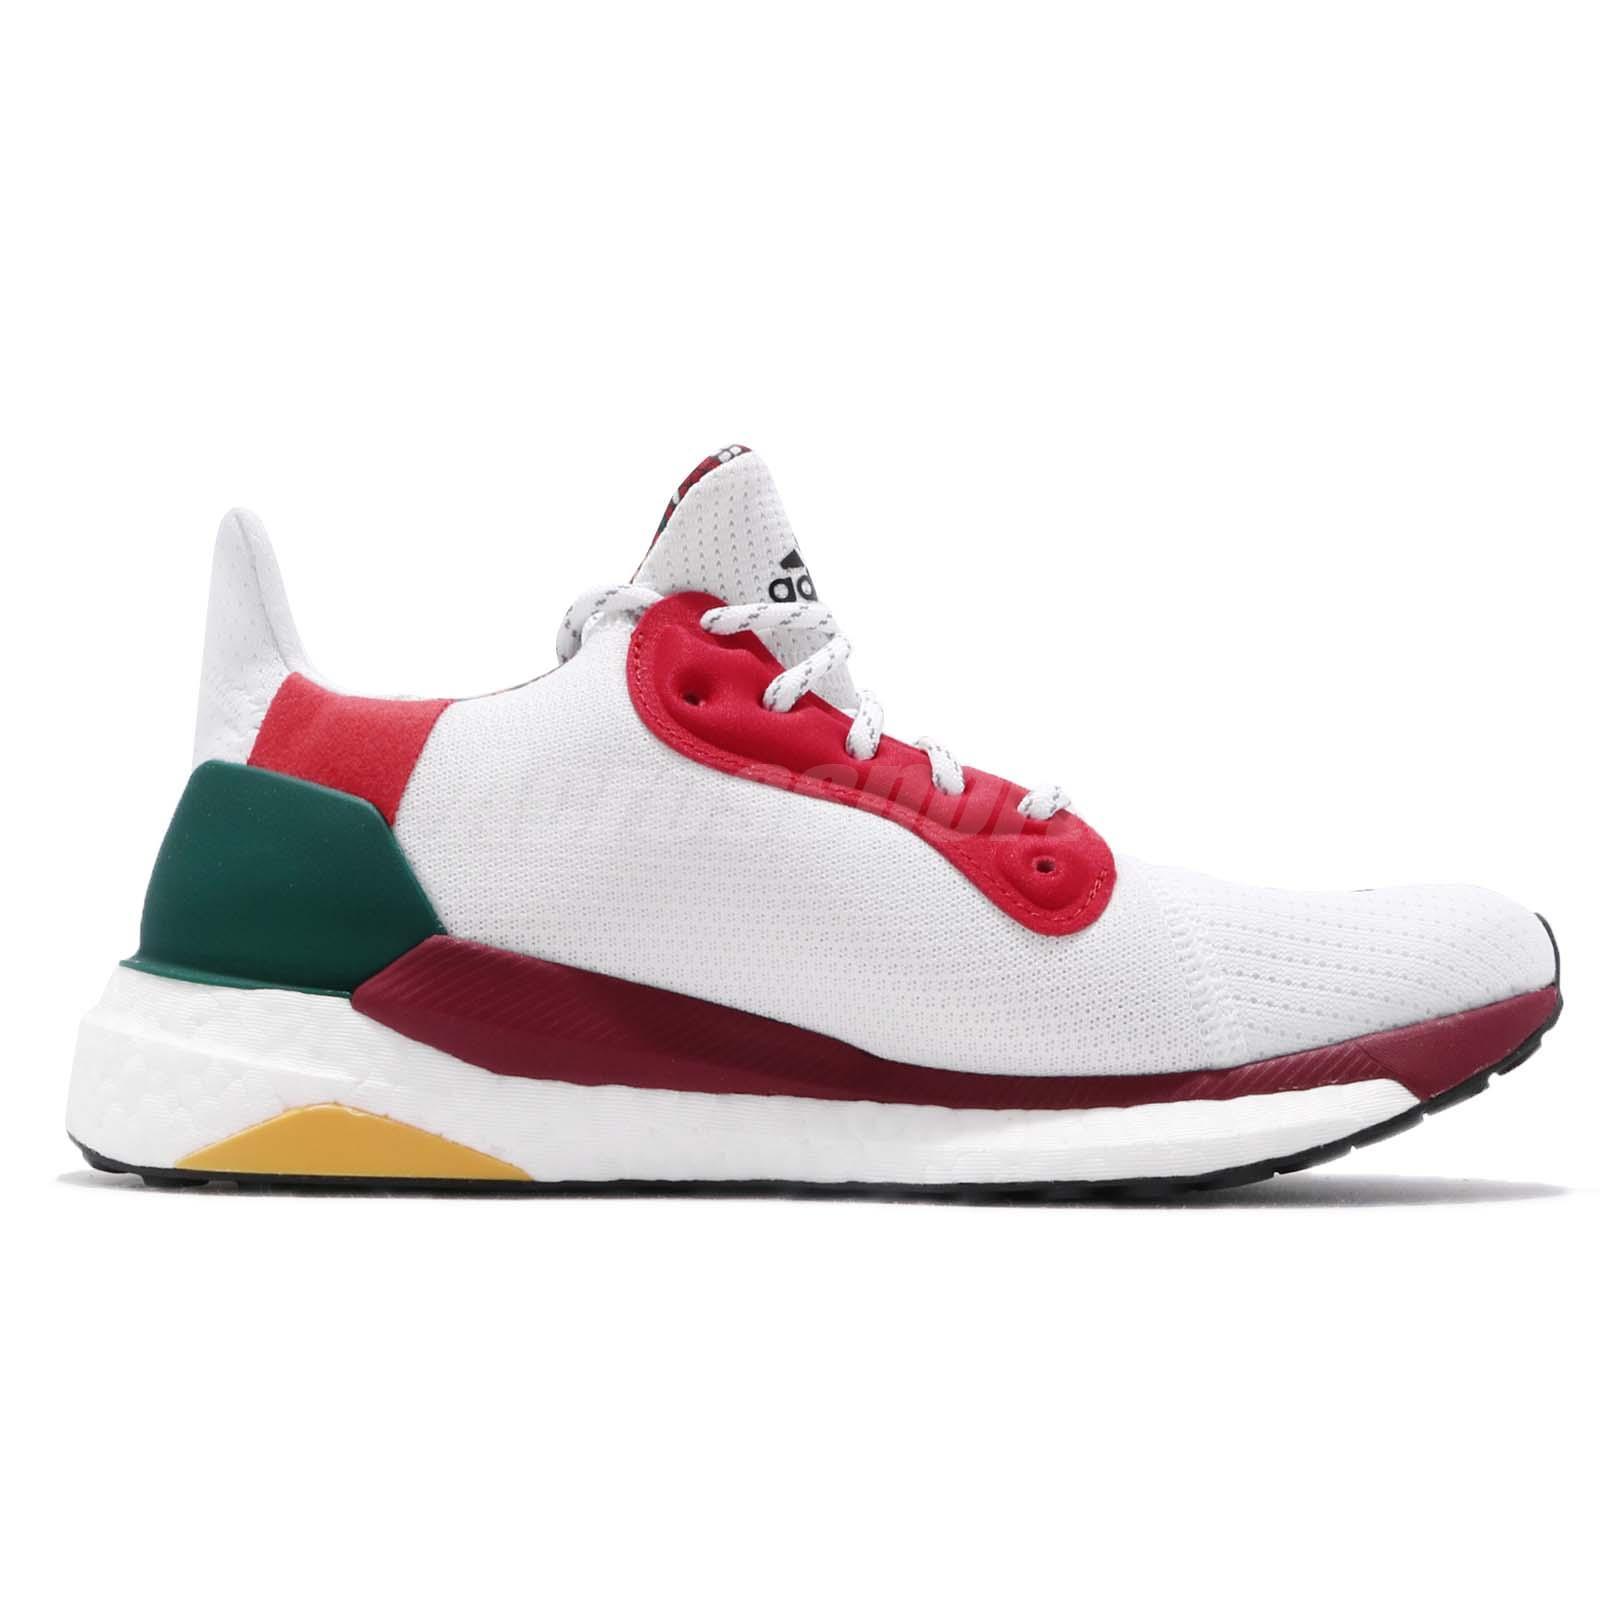 f9c8f6d8f adidas Solar Hu Glide W Pharrell Williams White Black Red Green ...